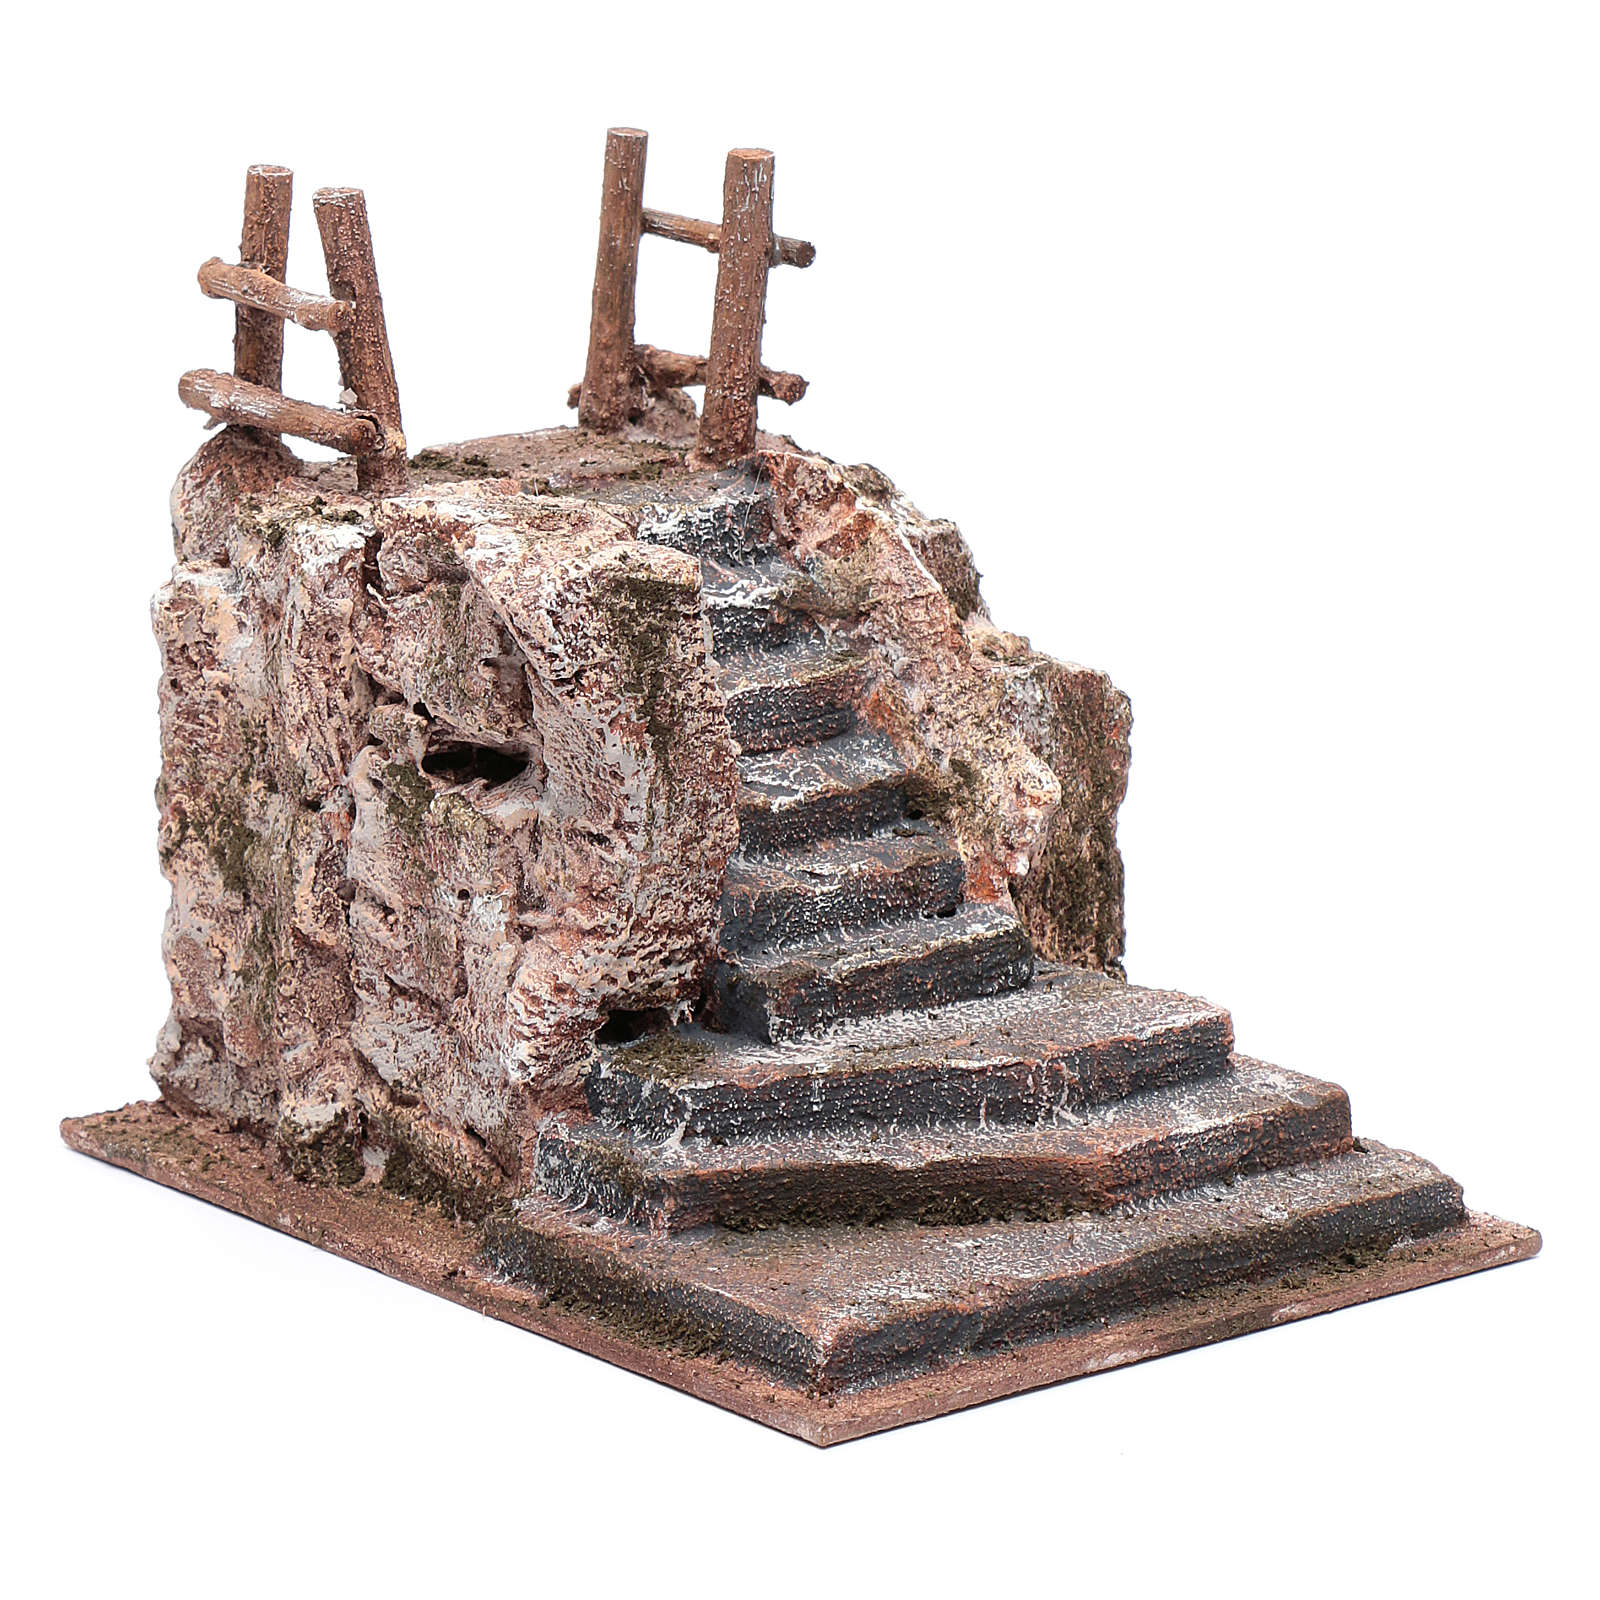 Escalier crèche avec esplanade 15x14x19 cm 4